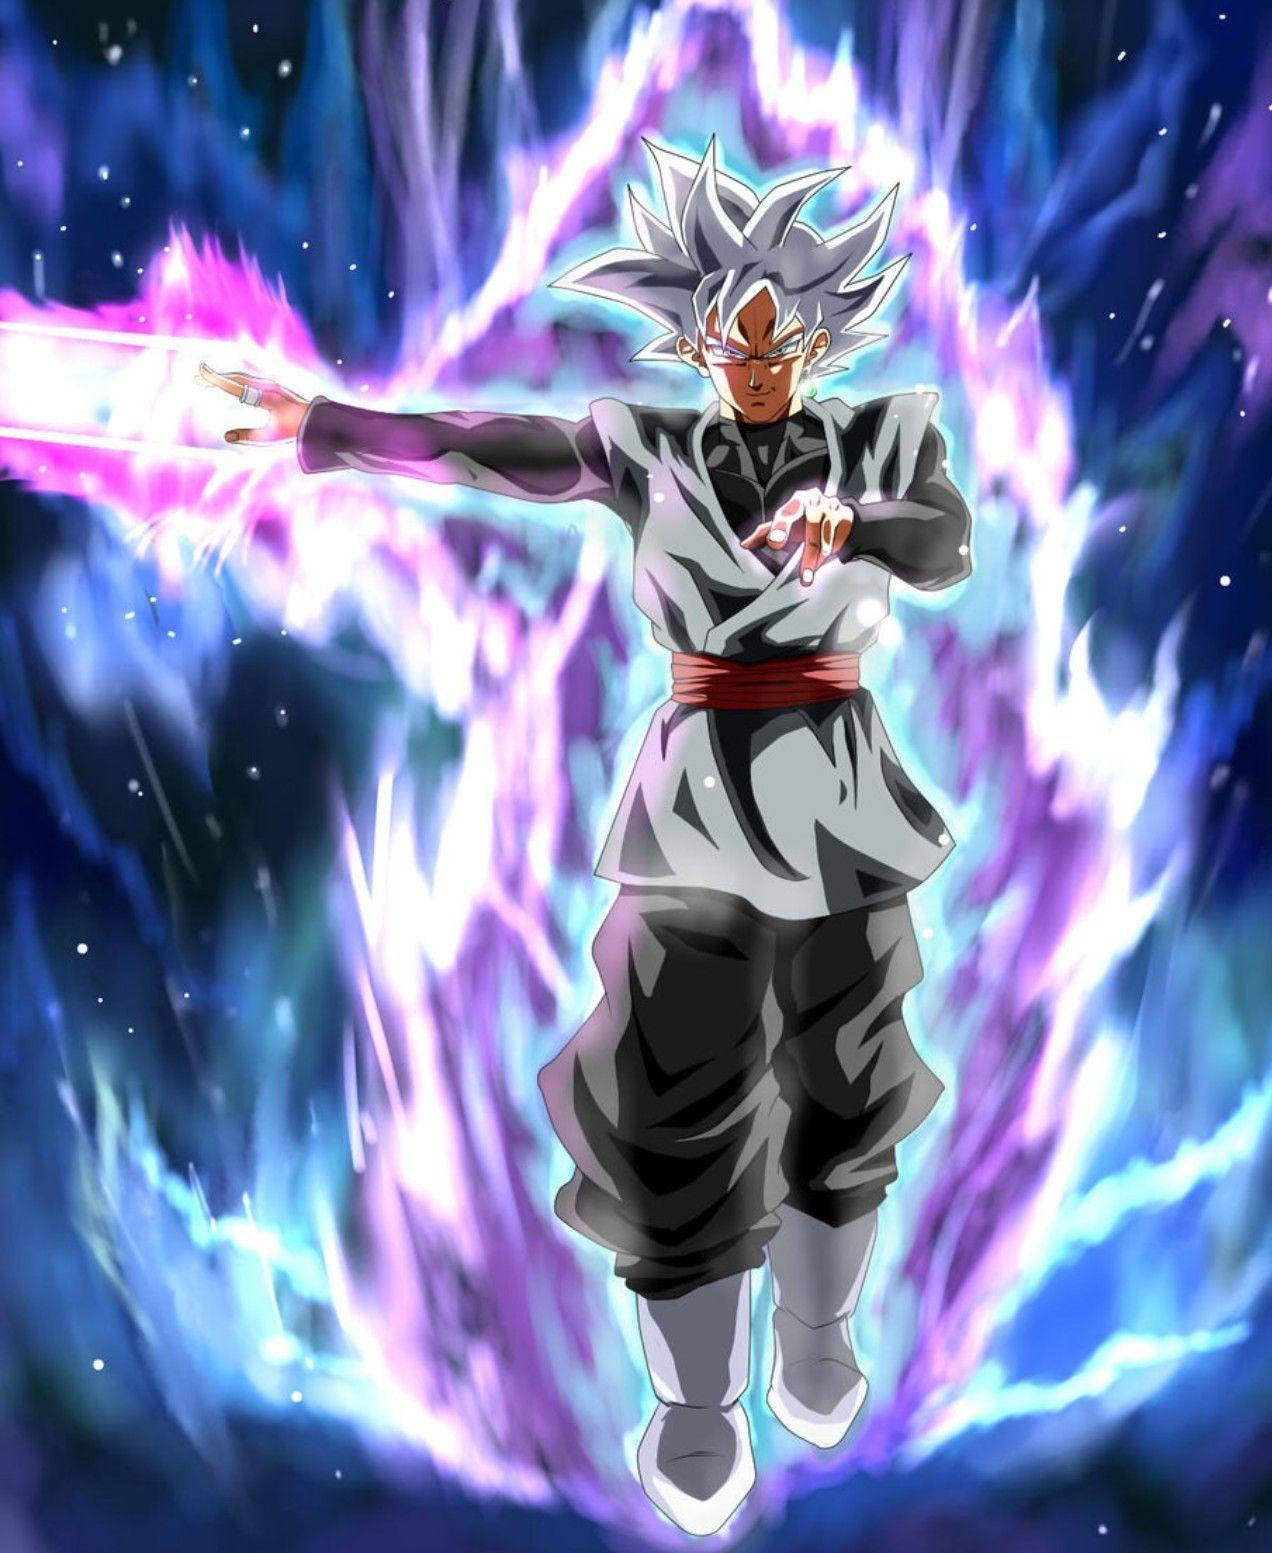 Ultra Instinct Goku Black Wallpapers Top Free Ultra Instinct Goku Black Backgrounds Wallpaperaccess